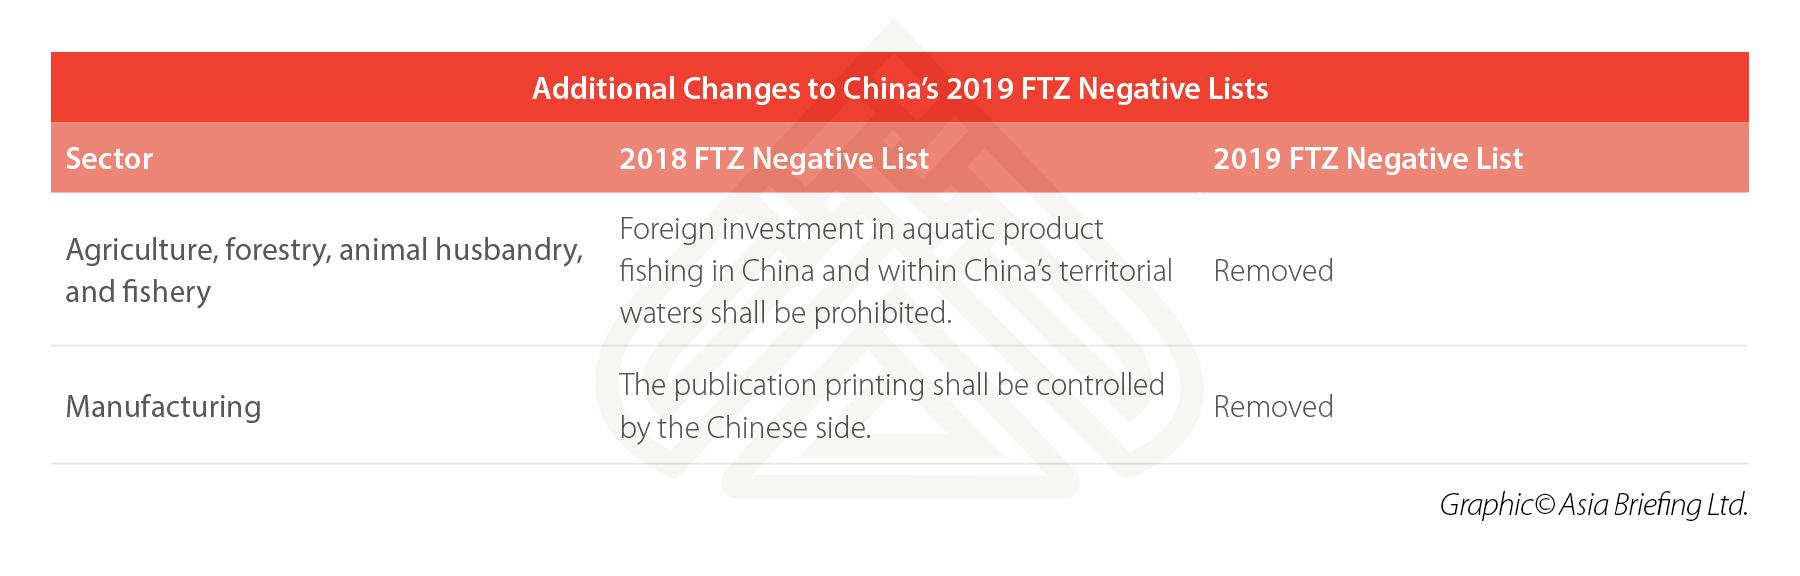 China-2019-FTZ-Negative-Lists